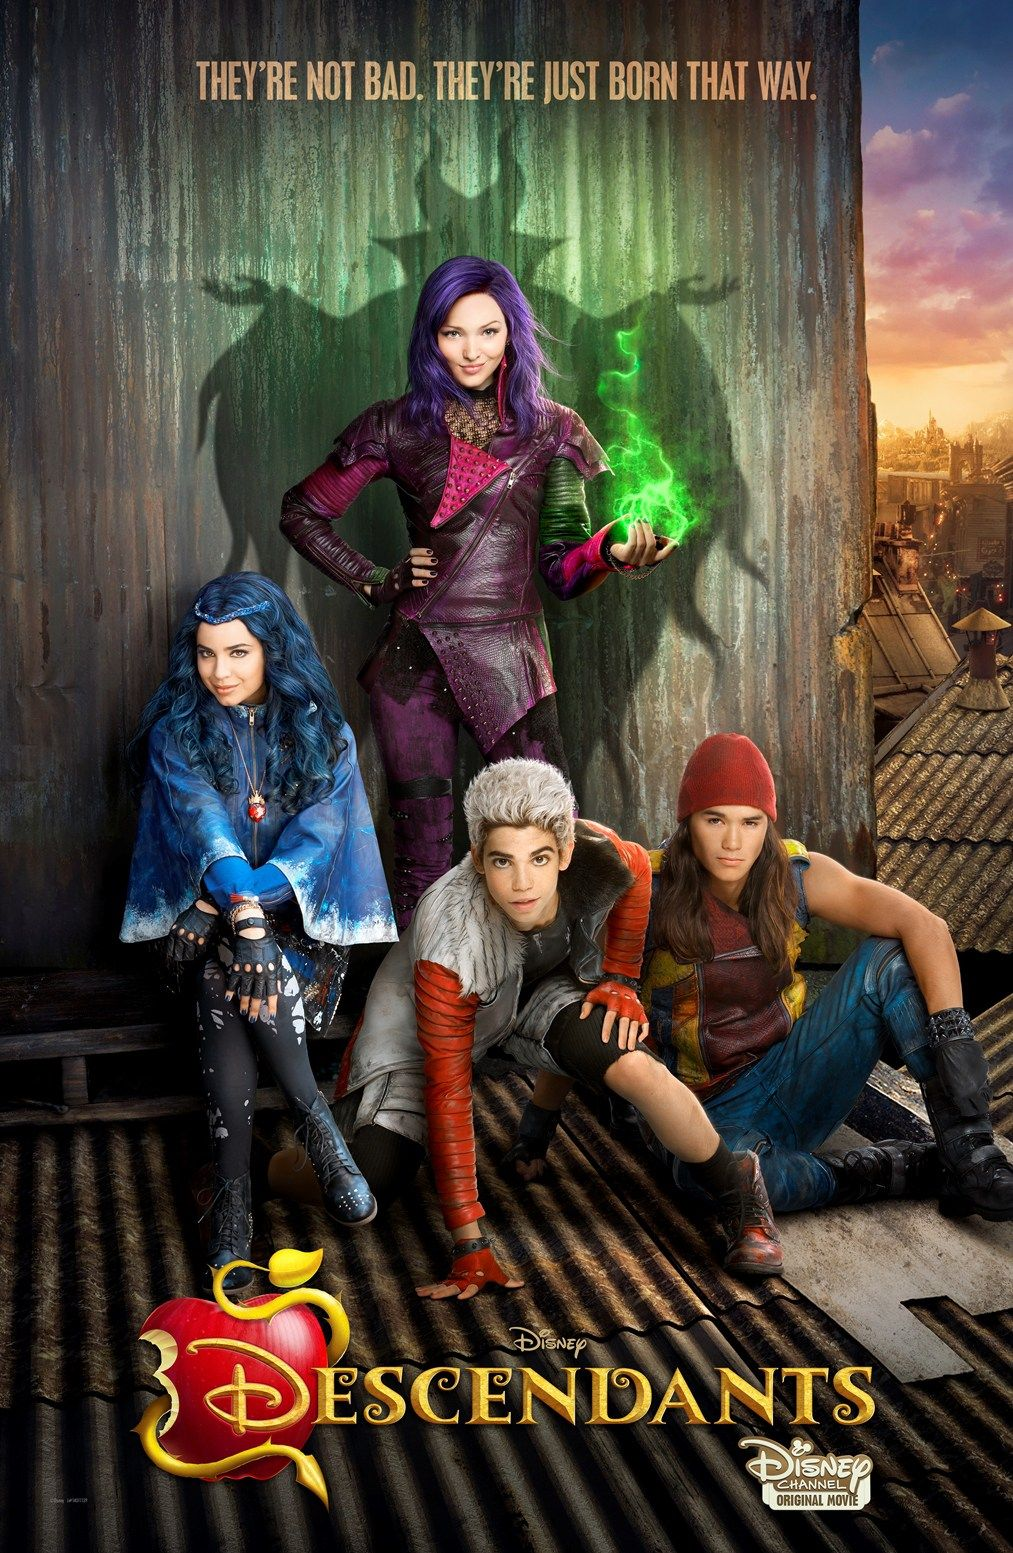 Trailer De Descendientes Tvmovie De Disney Voxpopulix Com Disney Descendants Movie Disney Channel Movies Disney Channel Descendants